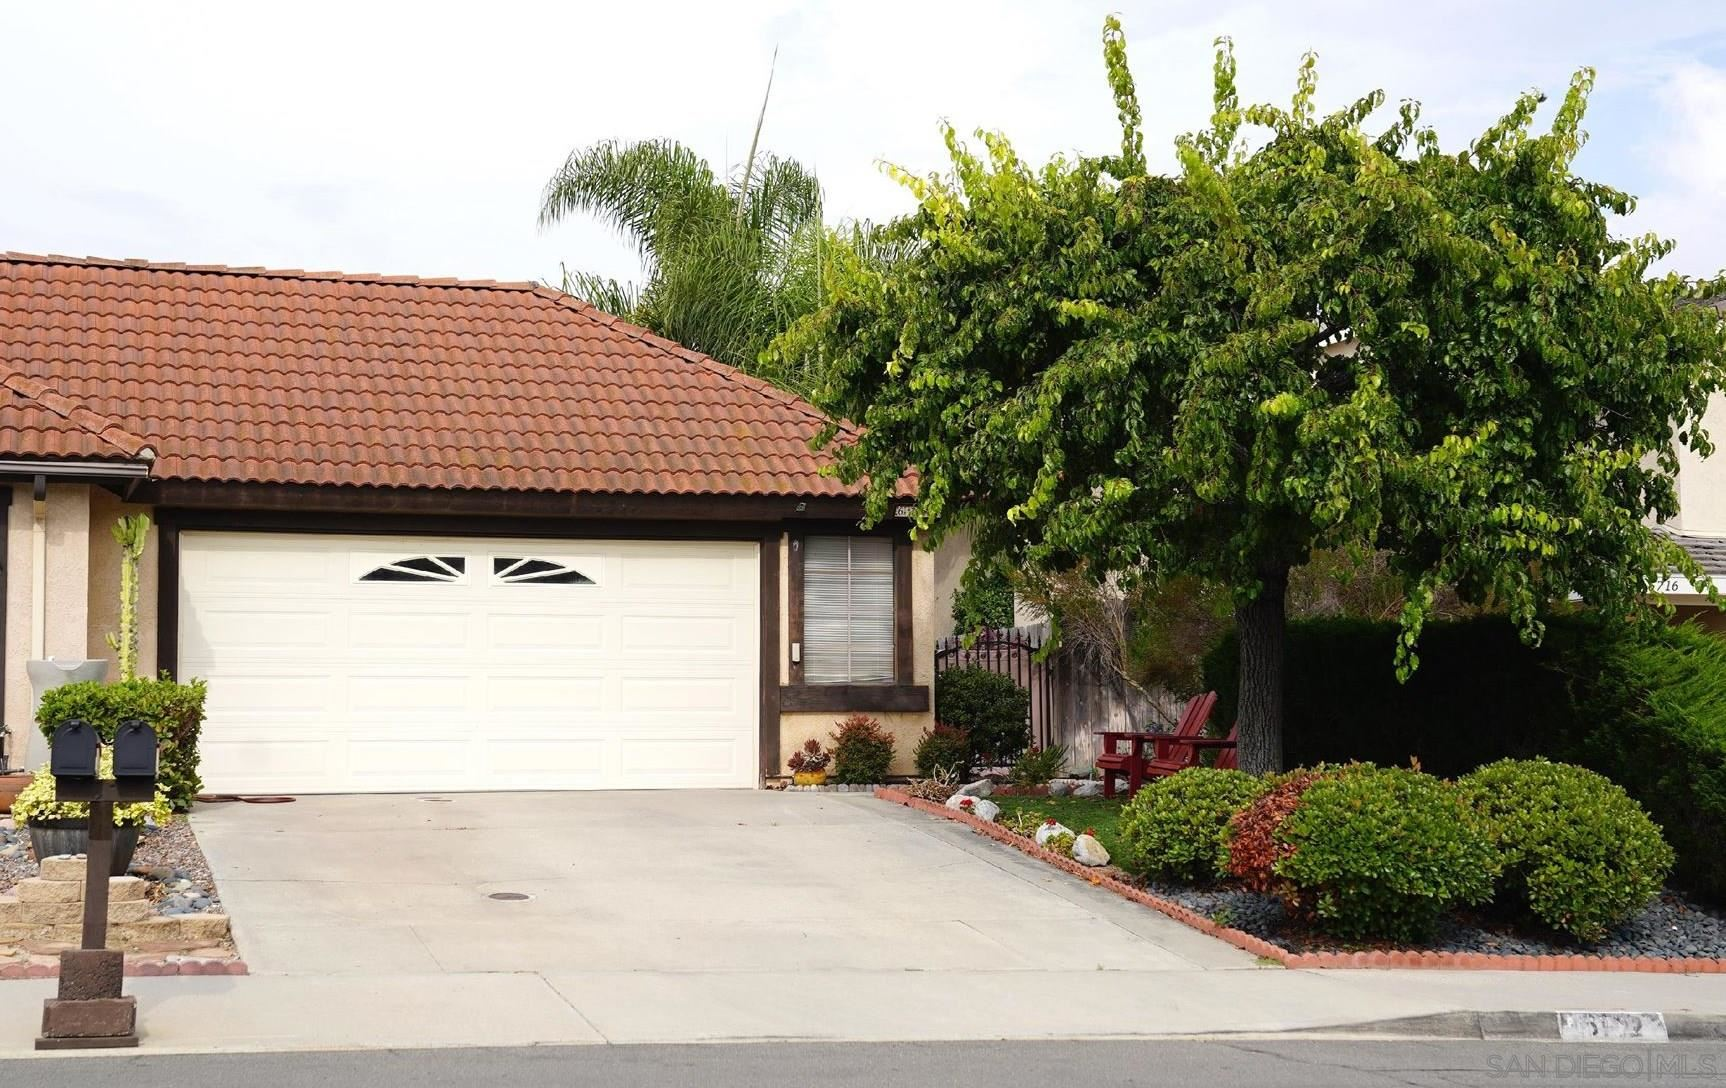 6712 Corintia St, Carlsbad, CA 92009 - MLS#: 210021203